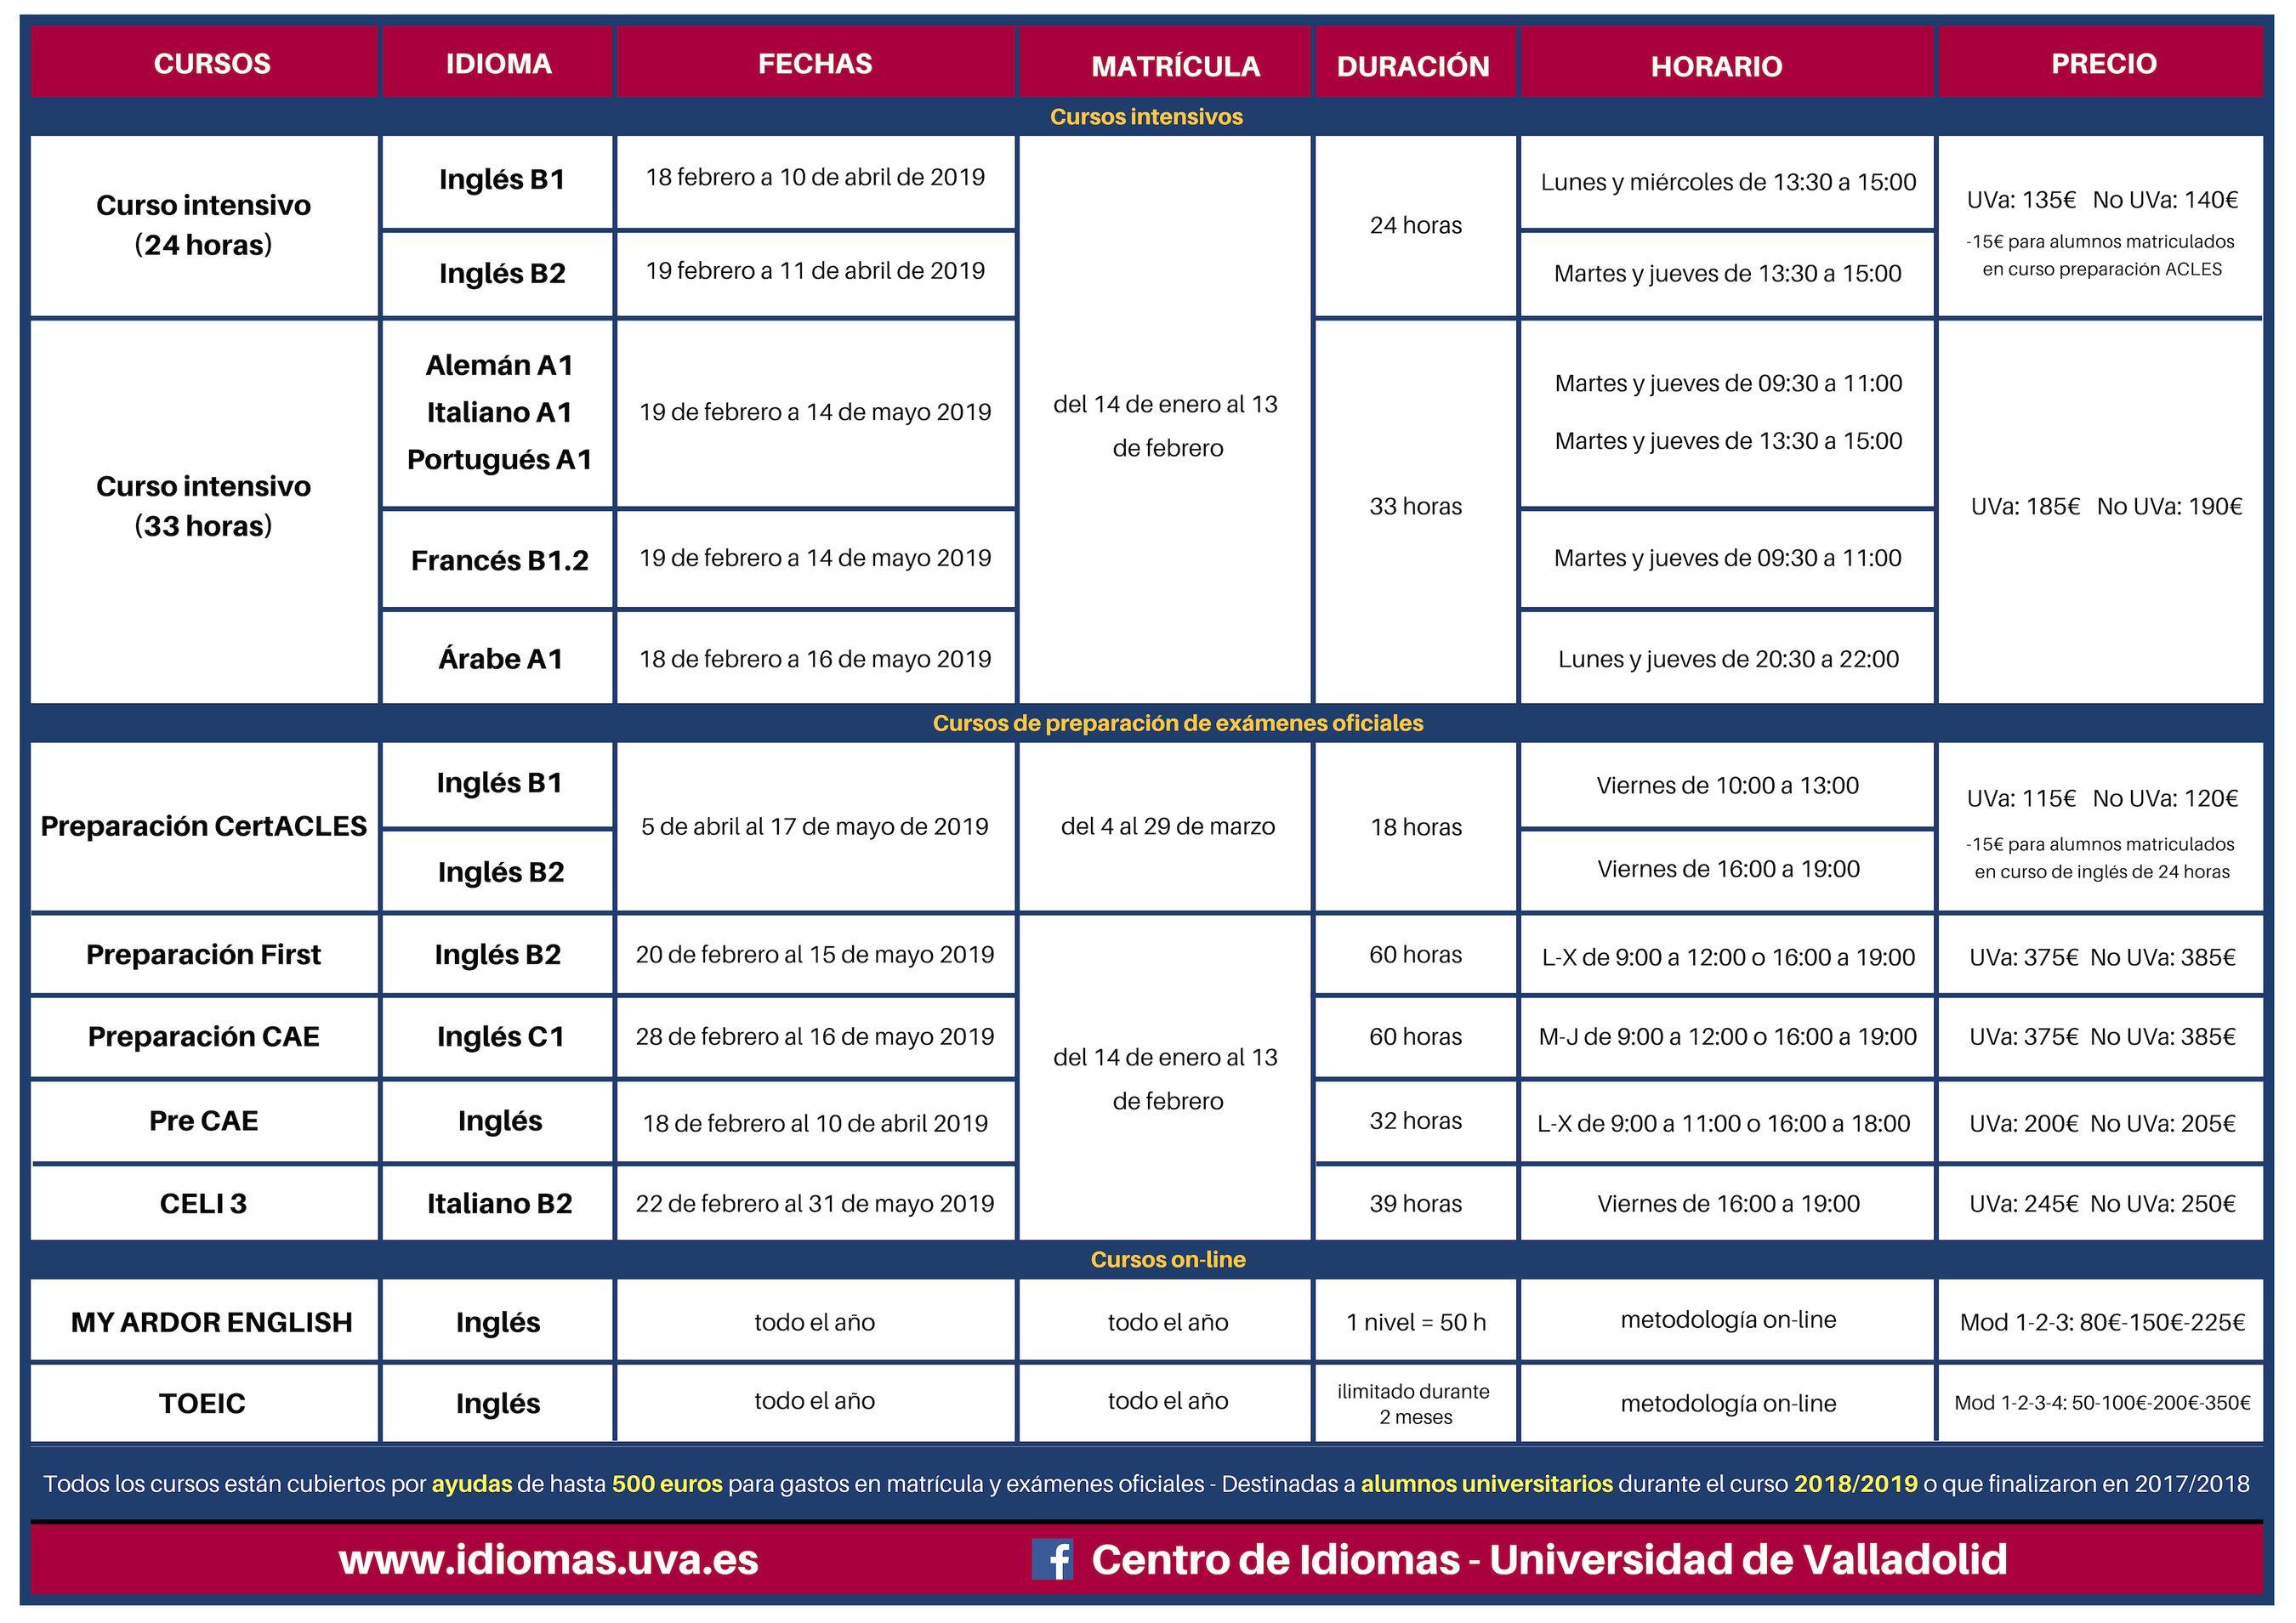 Folleto cursos febrero-mayo 2019 - UVA - interior final 2l